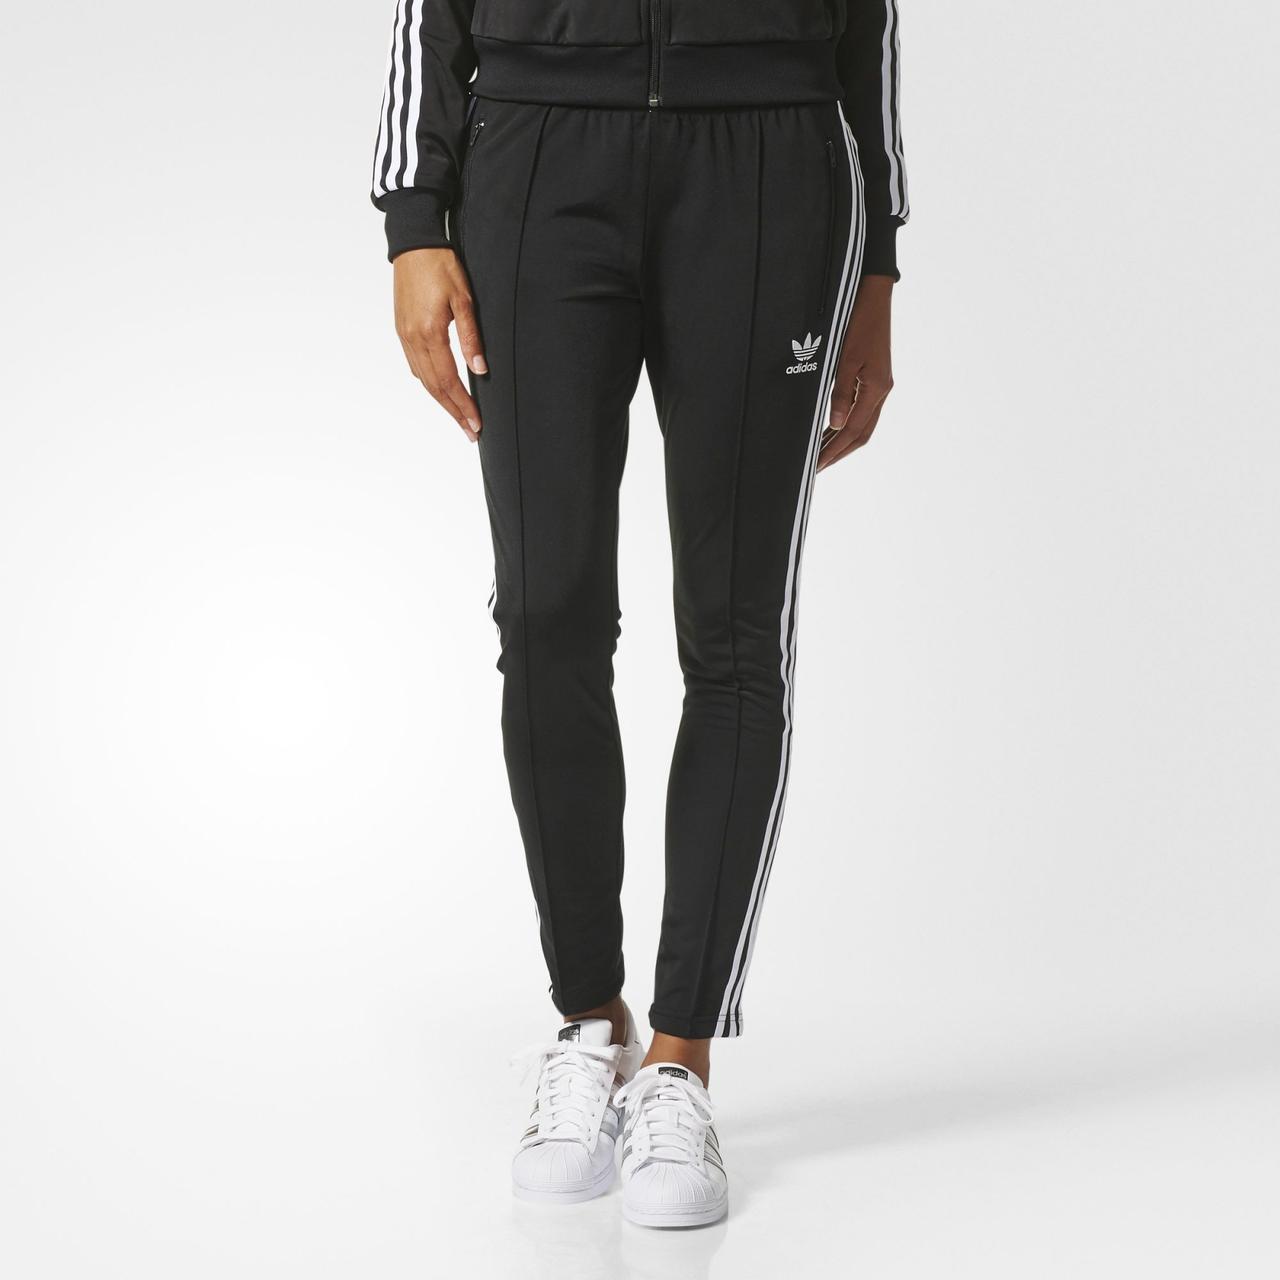 Женские брюки Adidas Originals SST (Артикул  BK0004) - Интернет-магазин  «Эксперт 55cf103ab78